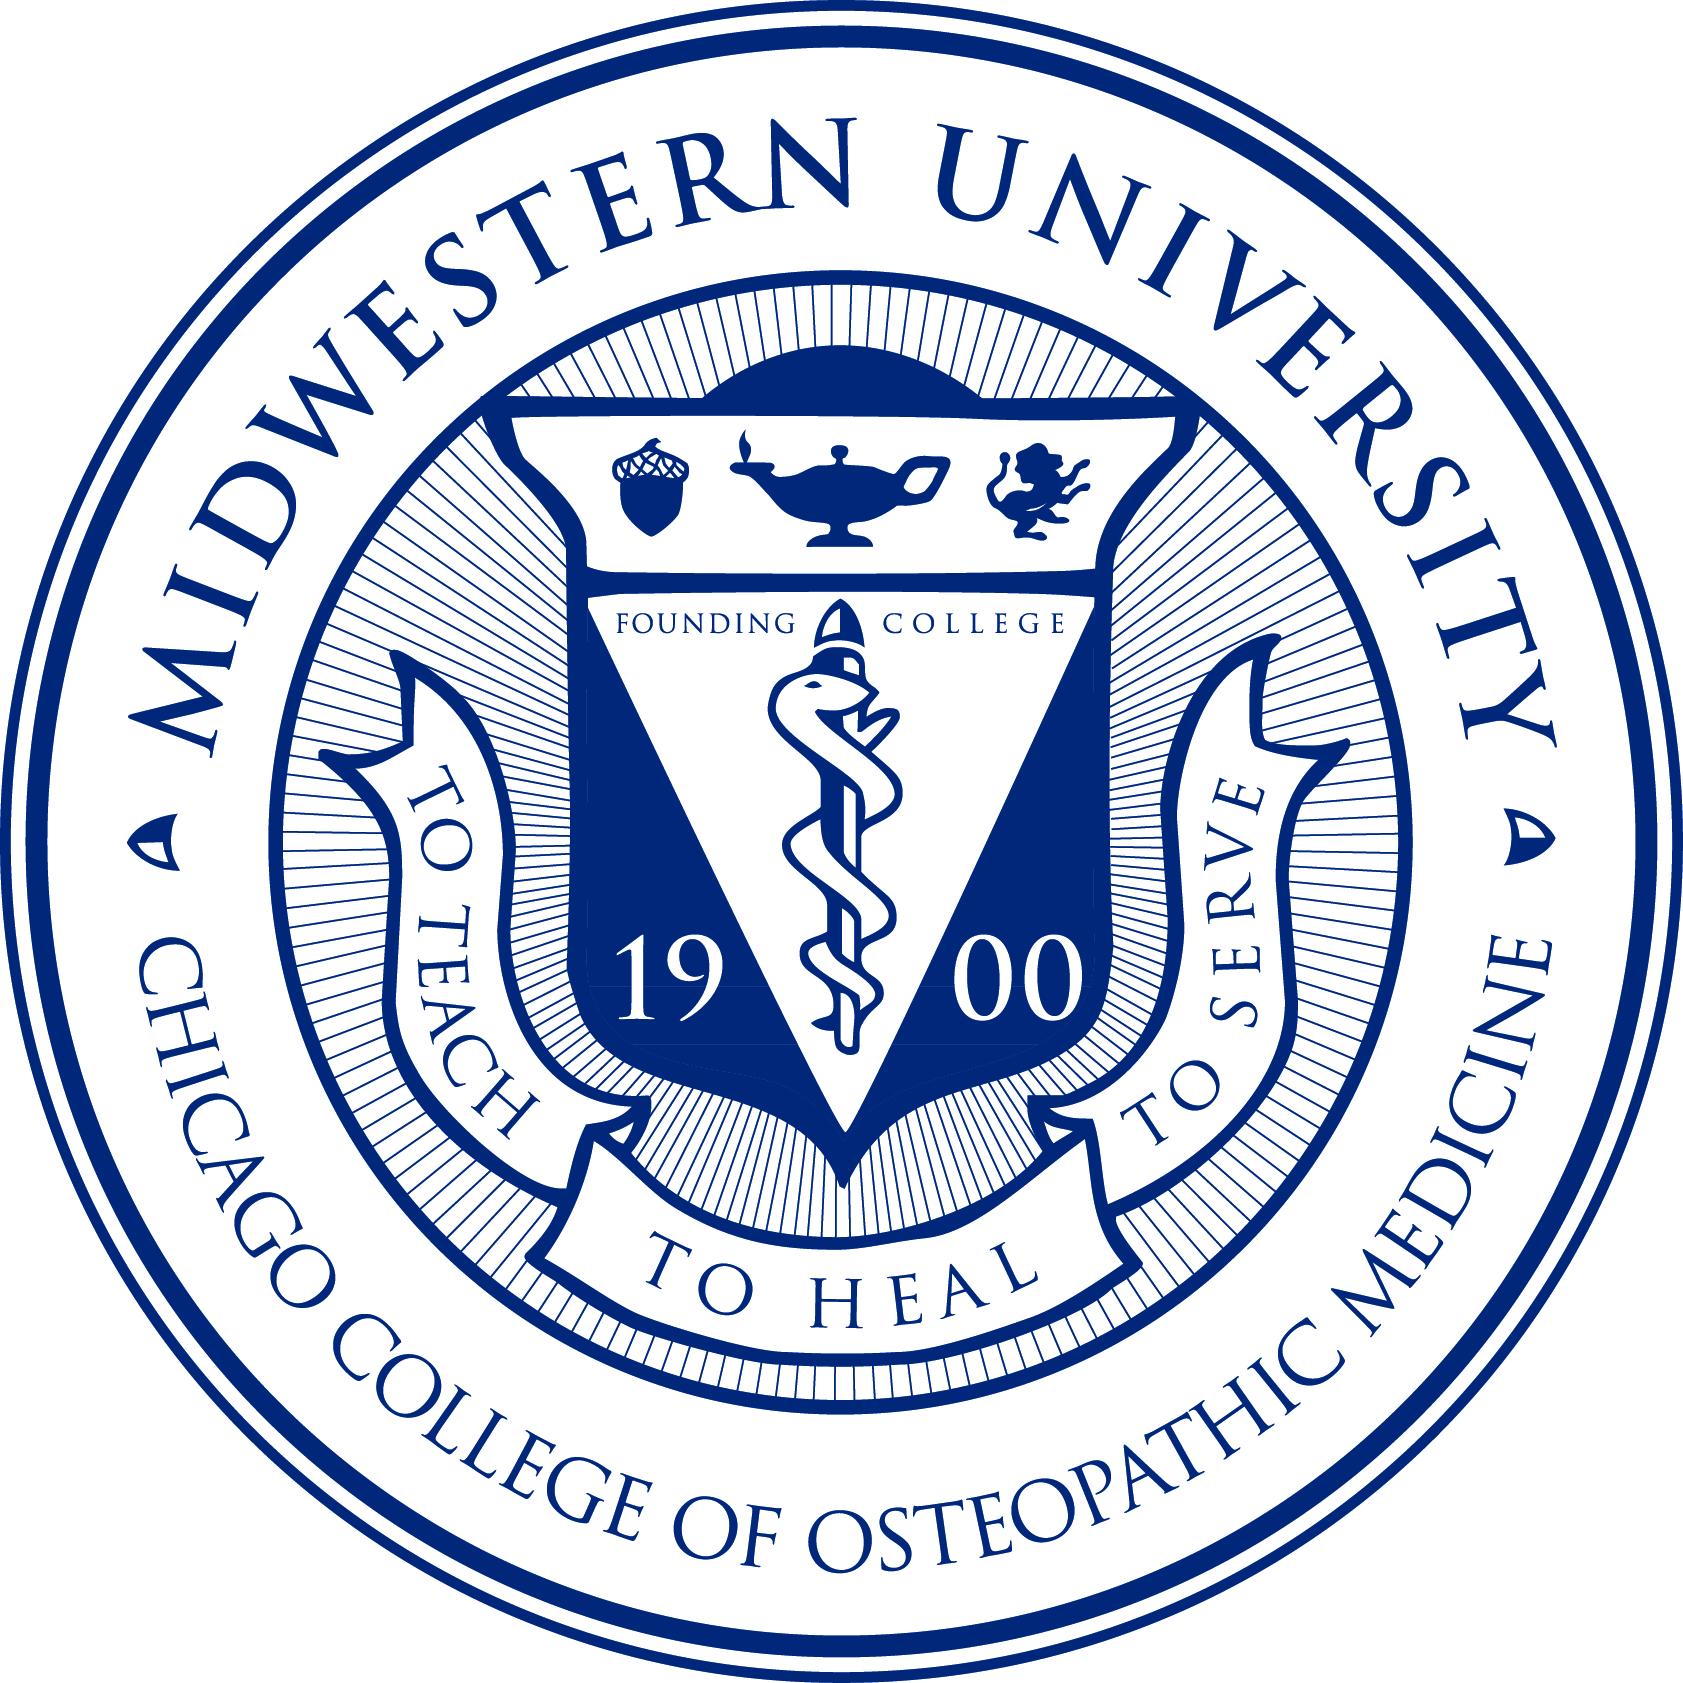 Chicago College Of Osteopathic Medicine Wikipedia